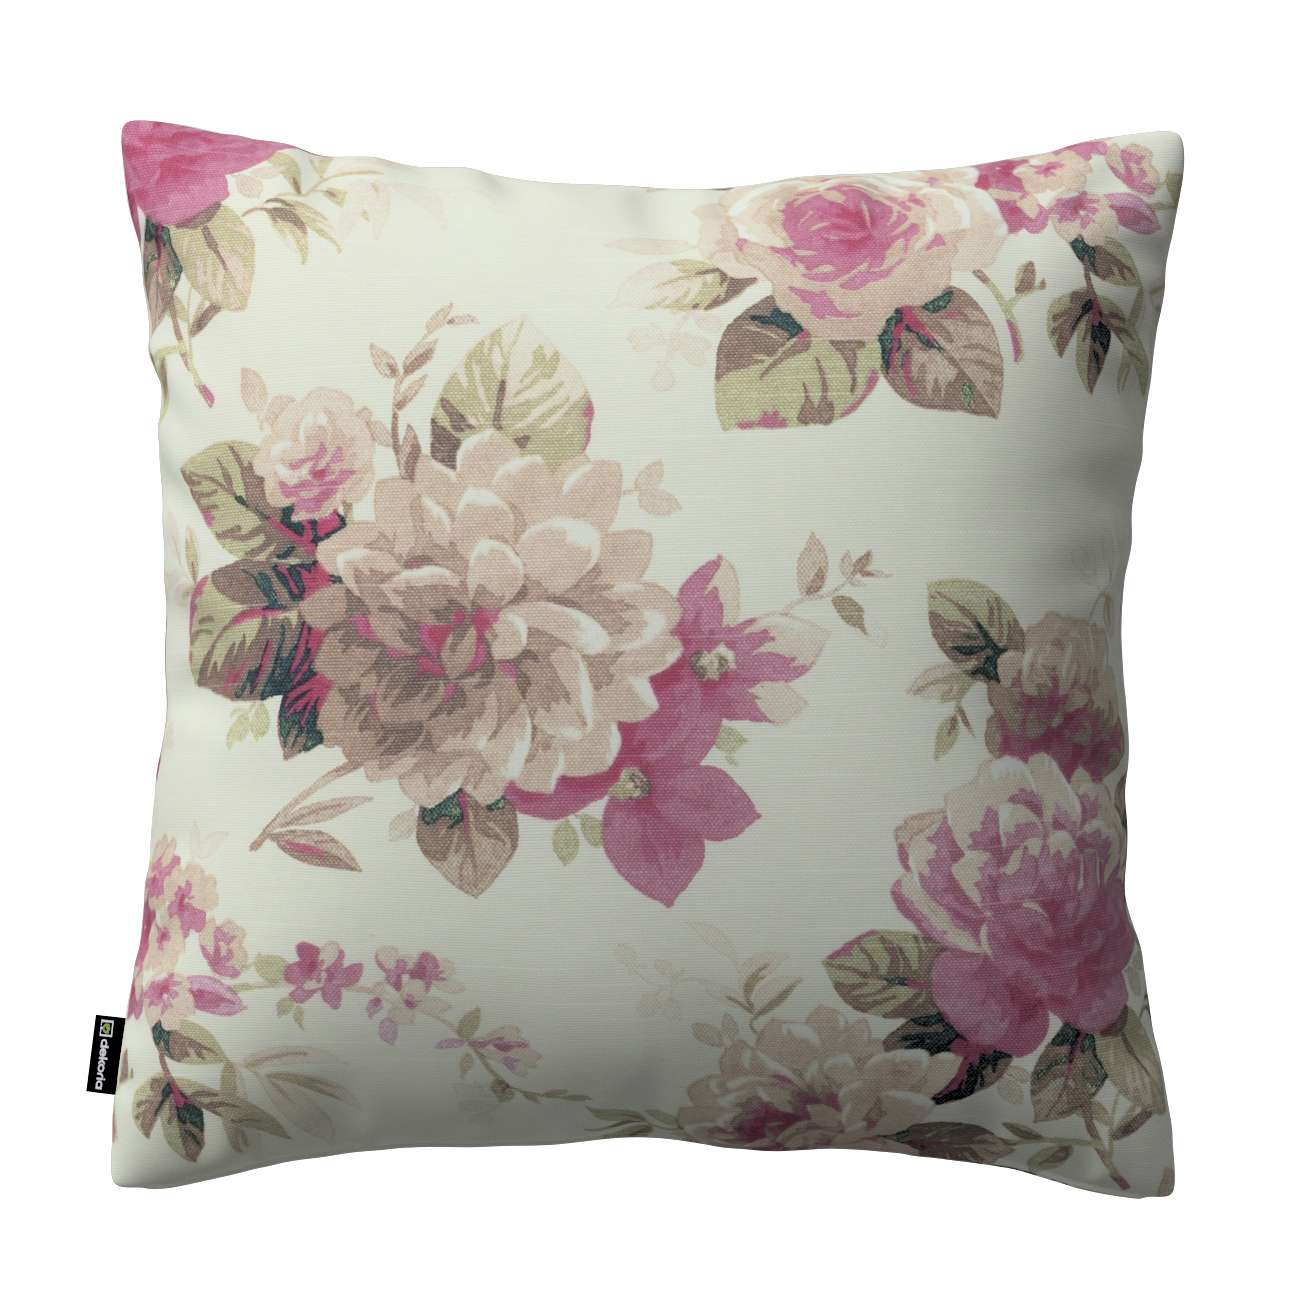 Poszewka Kinga na poduszkę w kolekcji Mirella, tkanina: 141-07